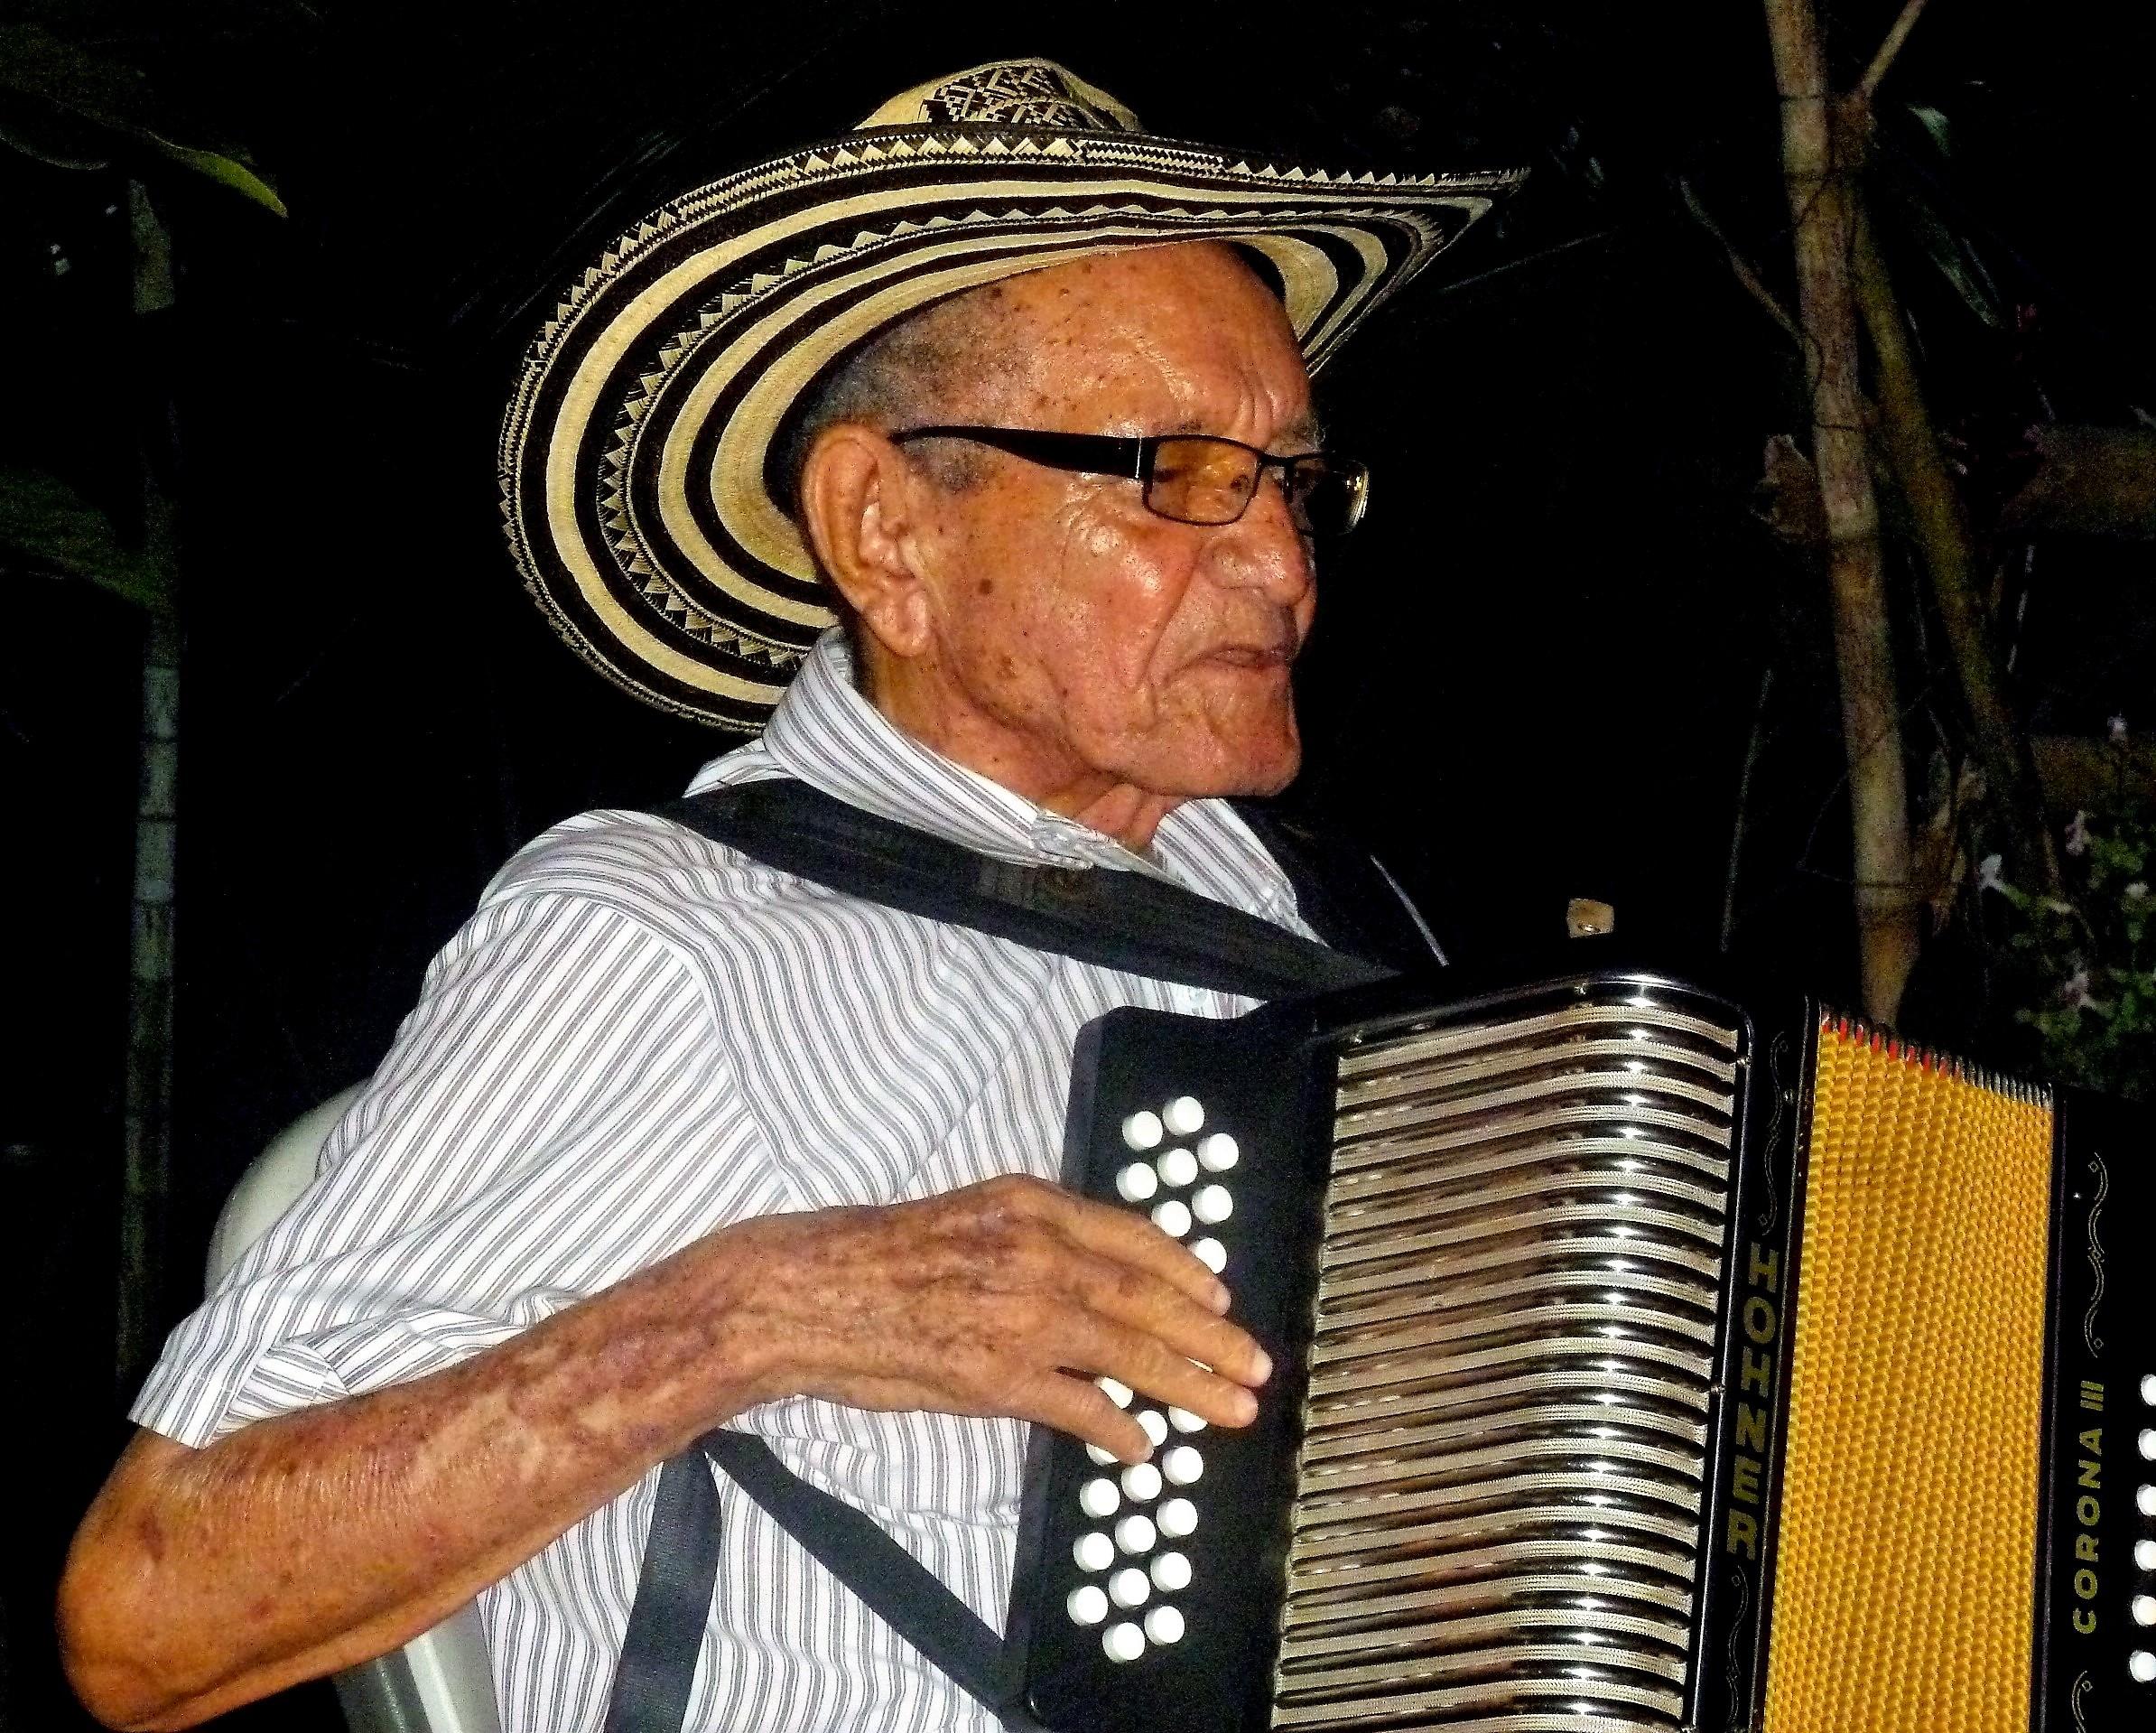 Chema Martínez